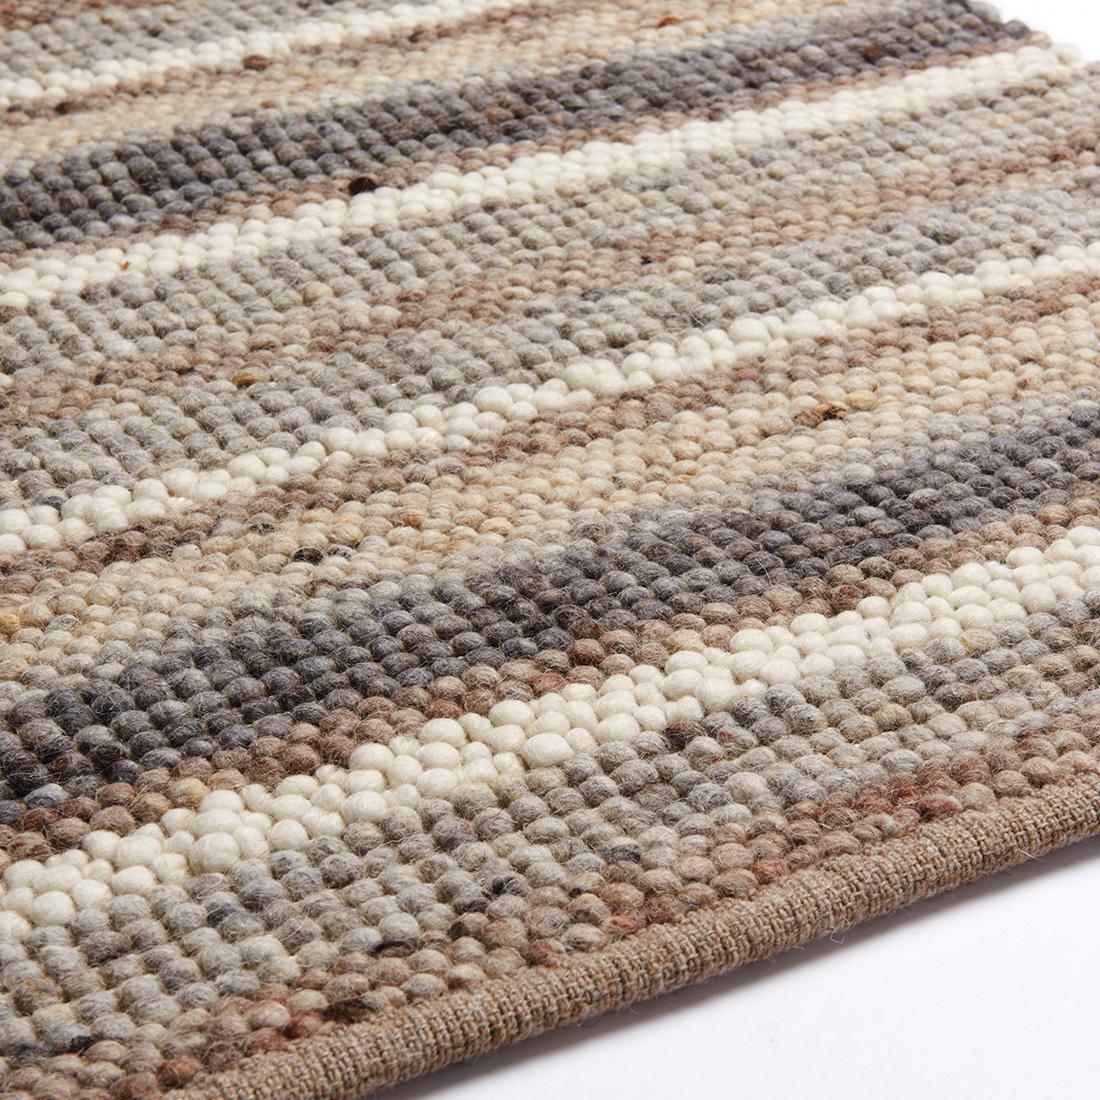 Vloerkleed Brinker Greenland Stripes 1048 | 240 x 340 cm